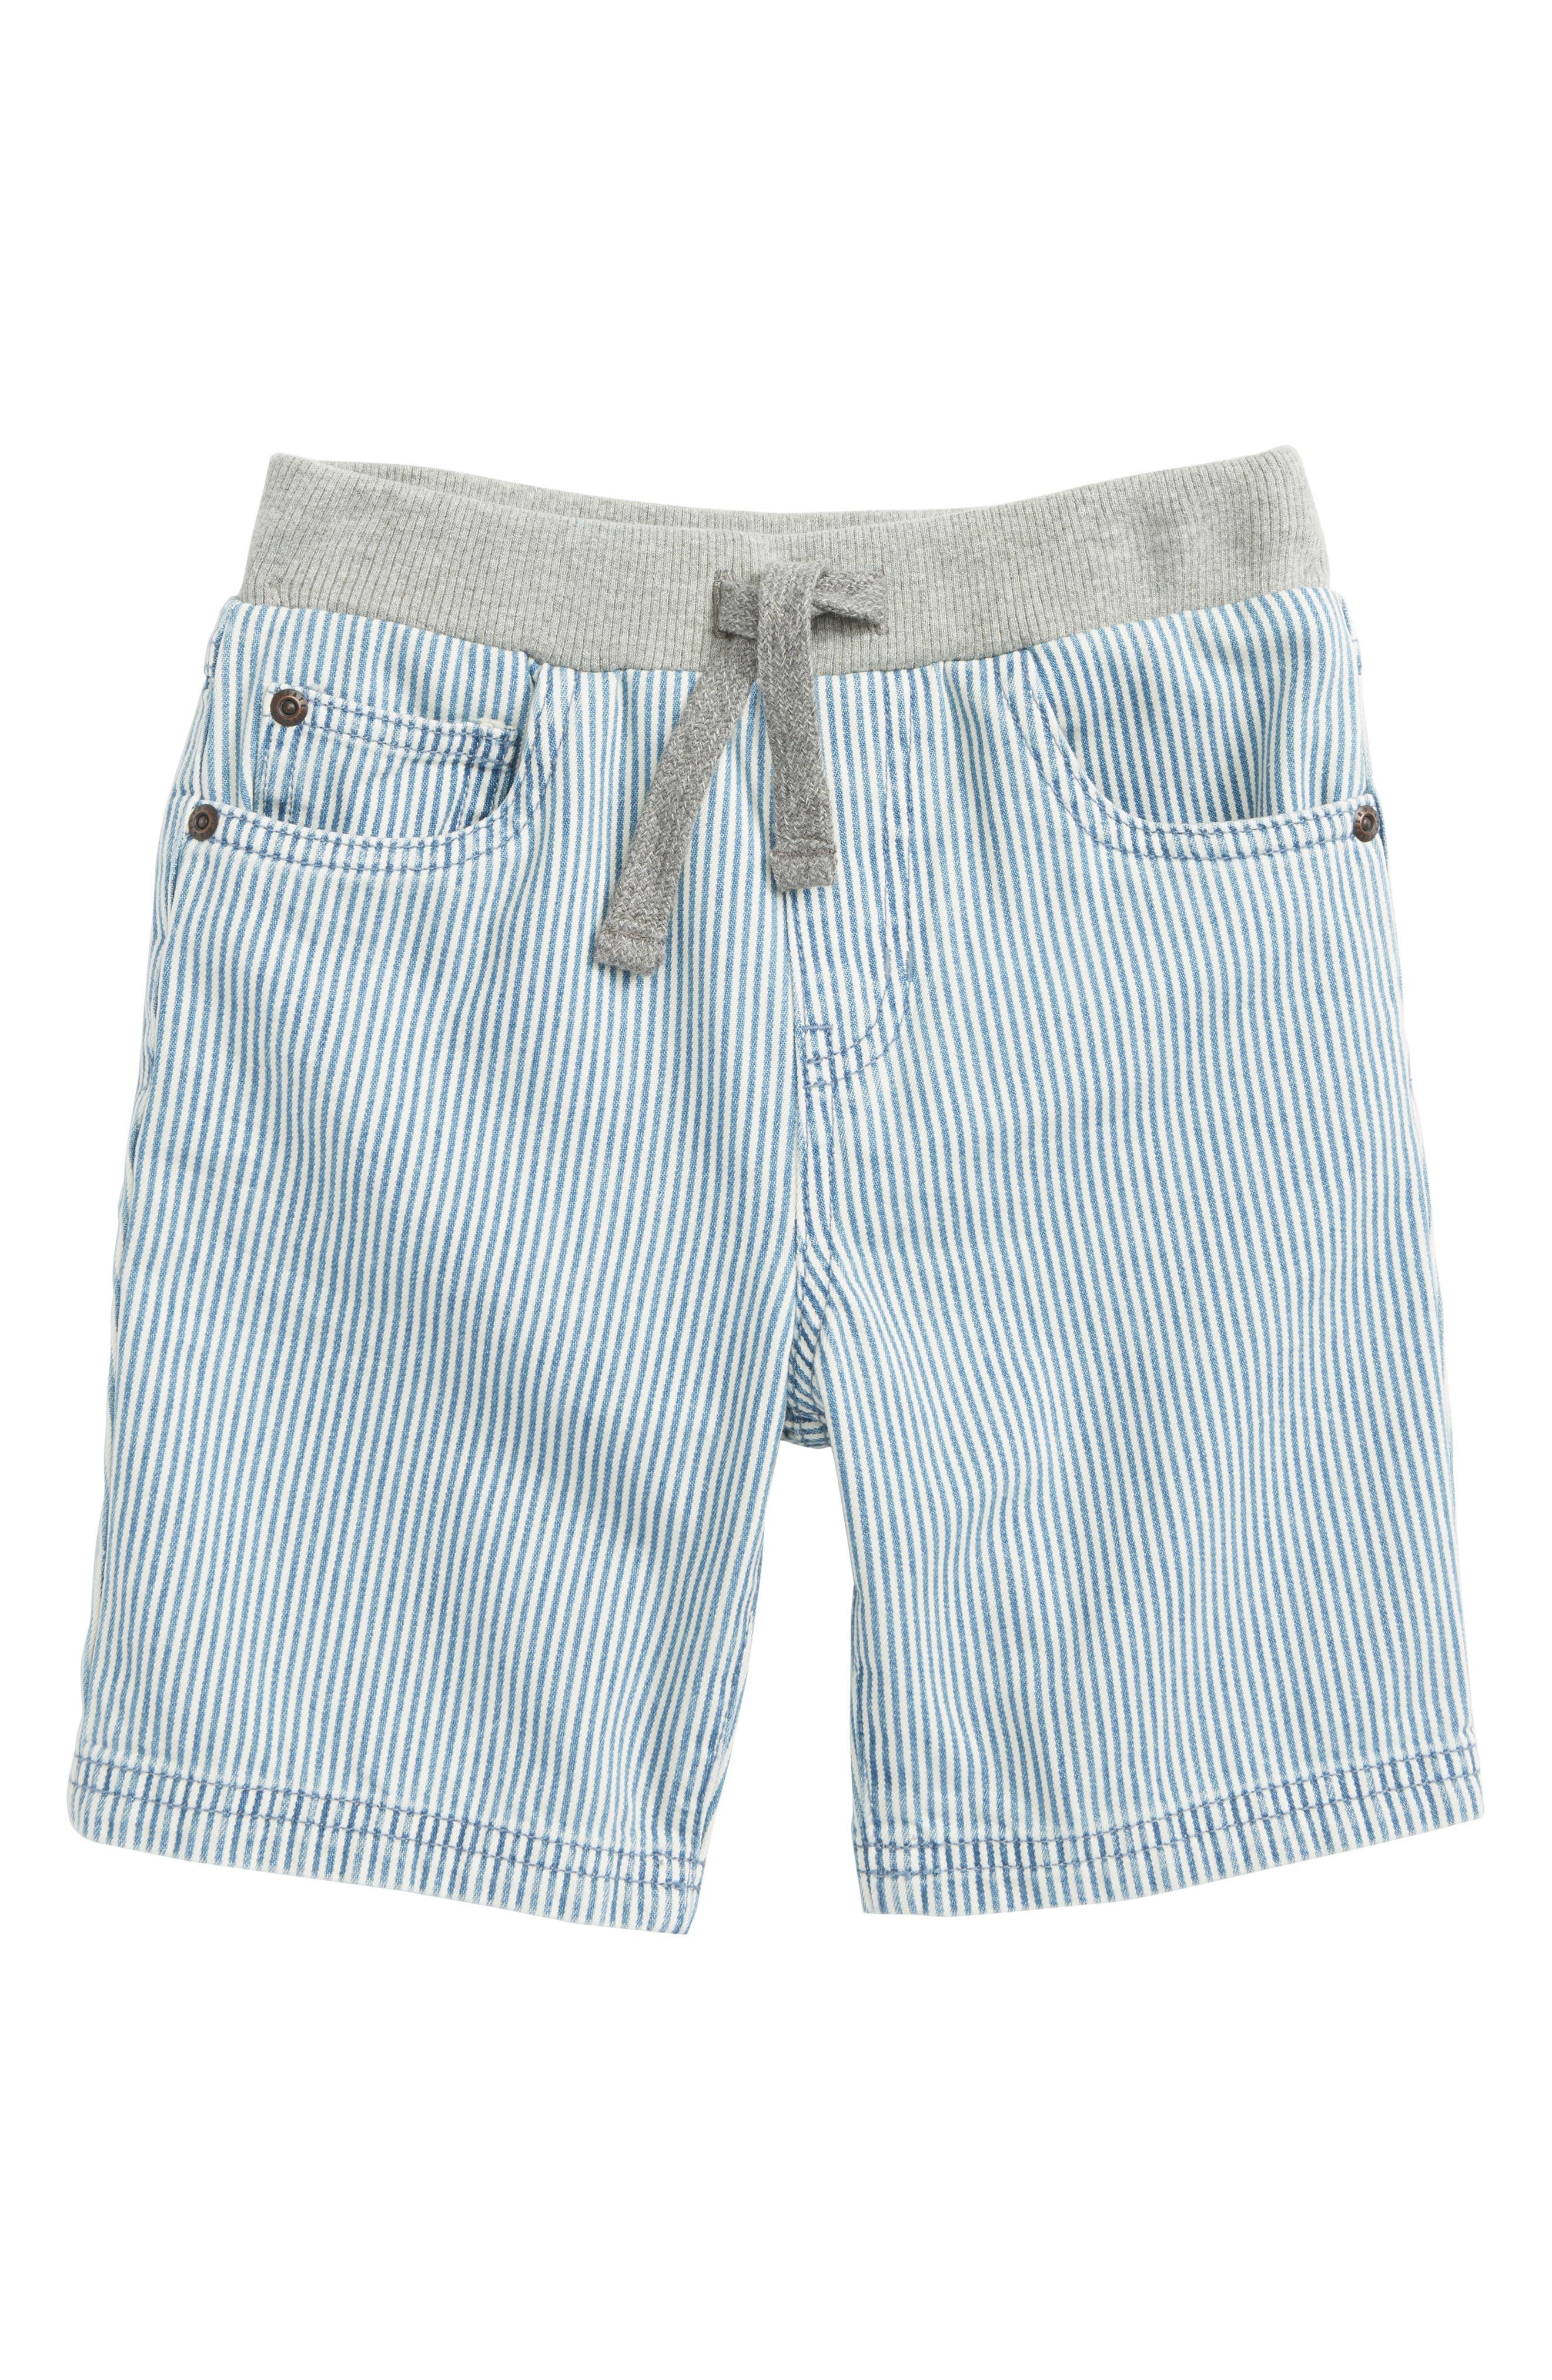 Stripe Shorts,                             Main thumbnail 1, color,                             Sanford Wash